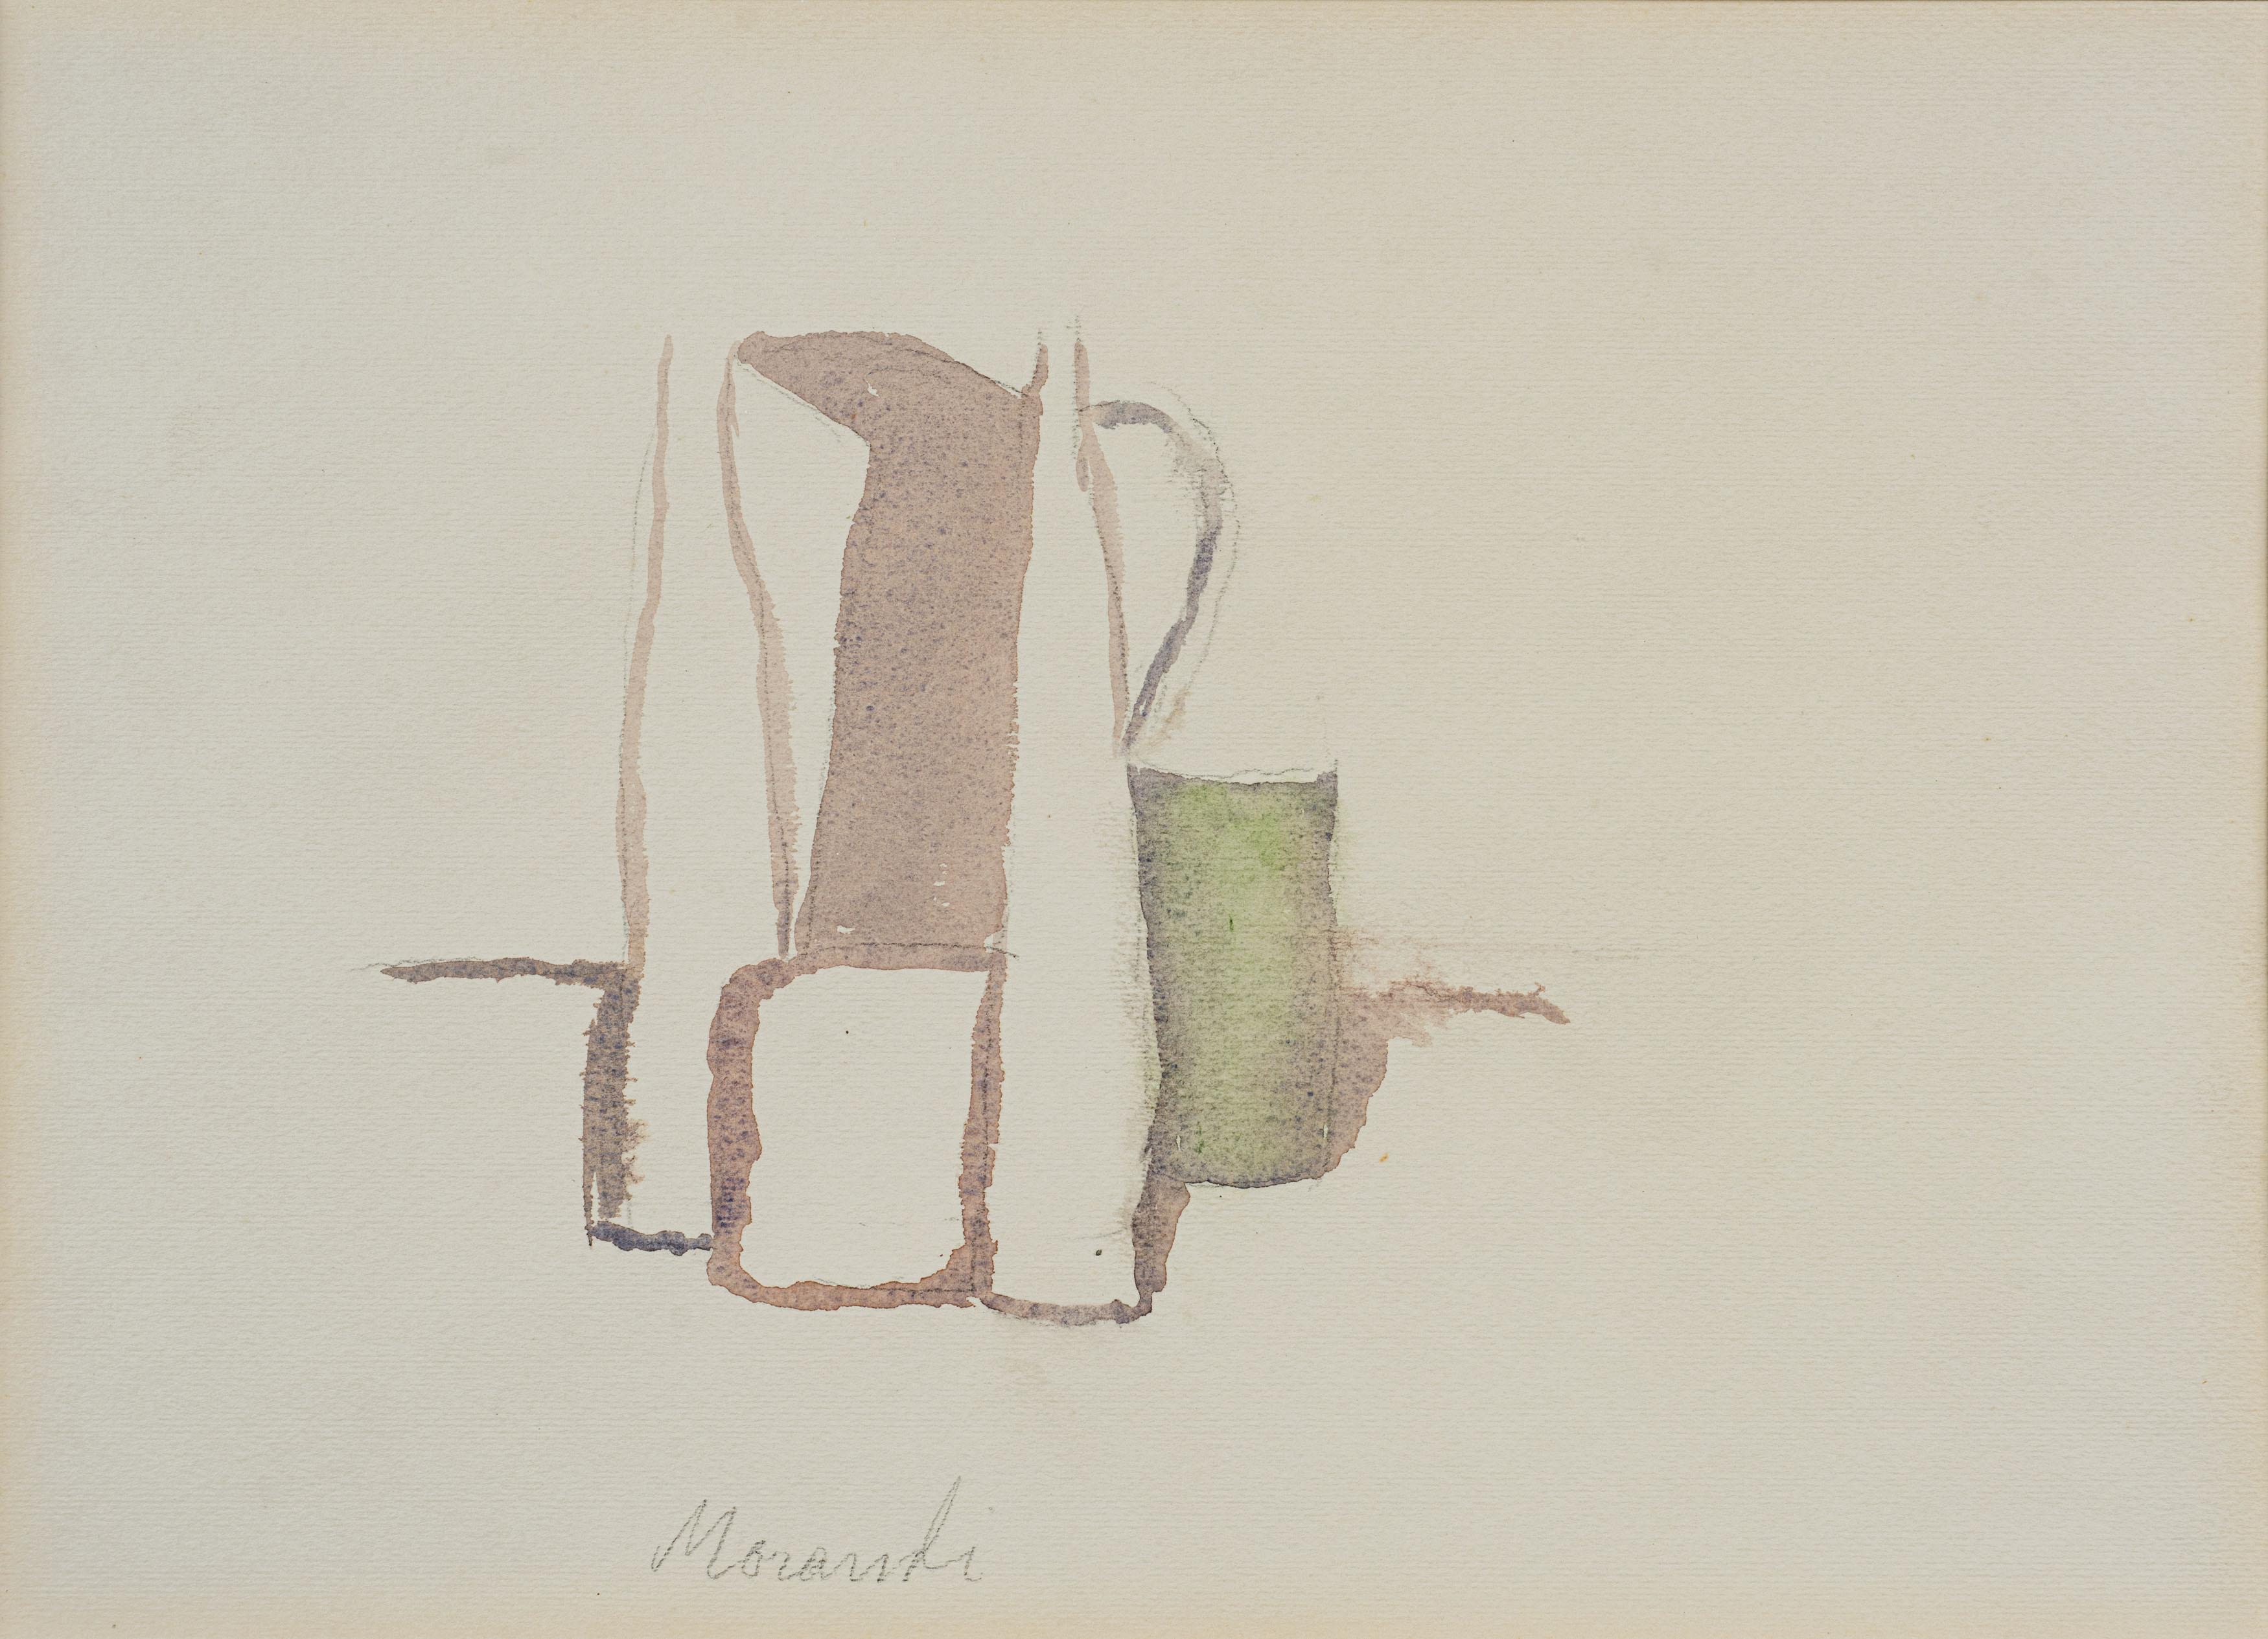 GIORGIO MORANDI - Image 2 of 4